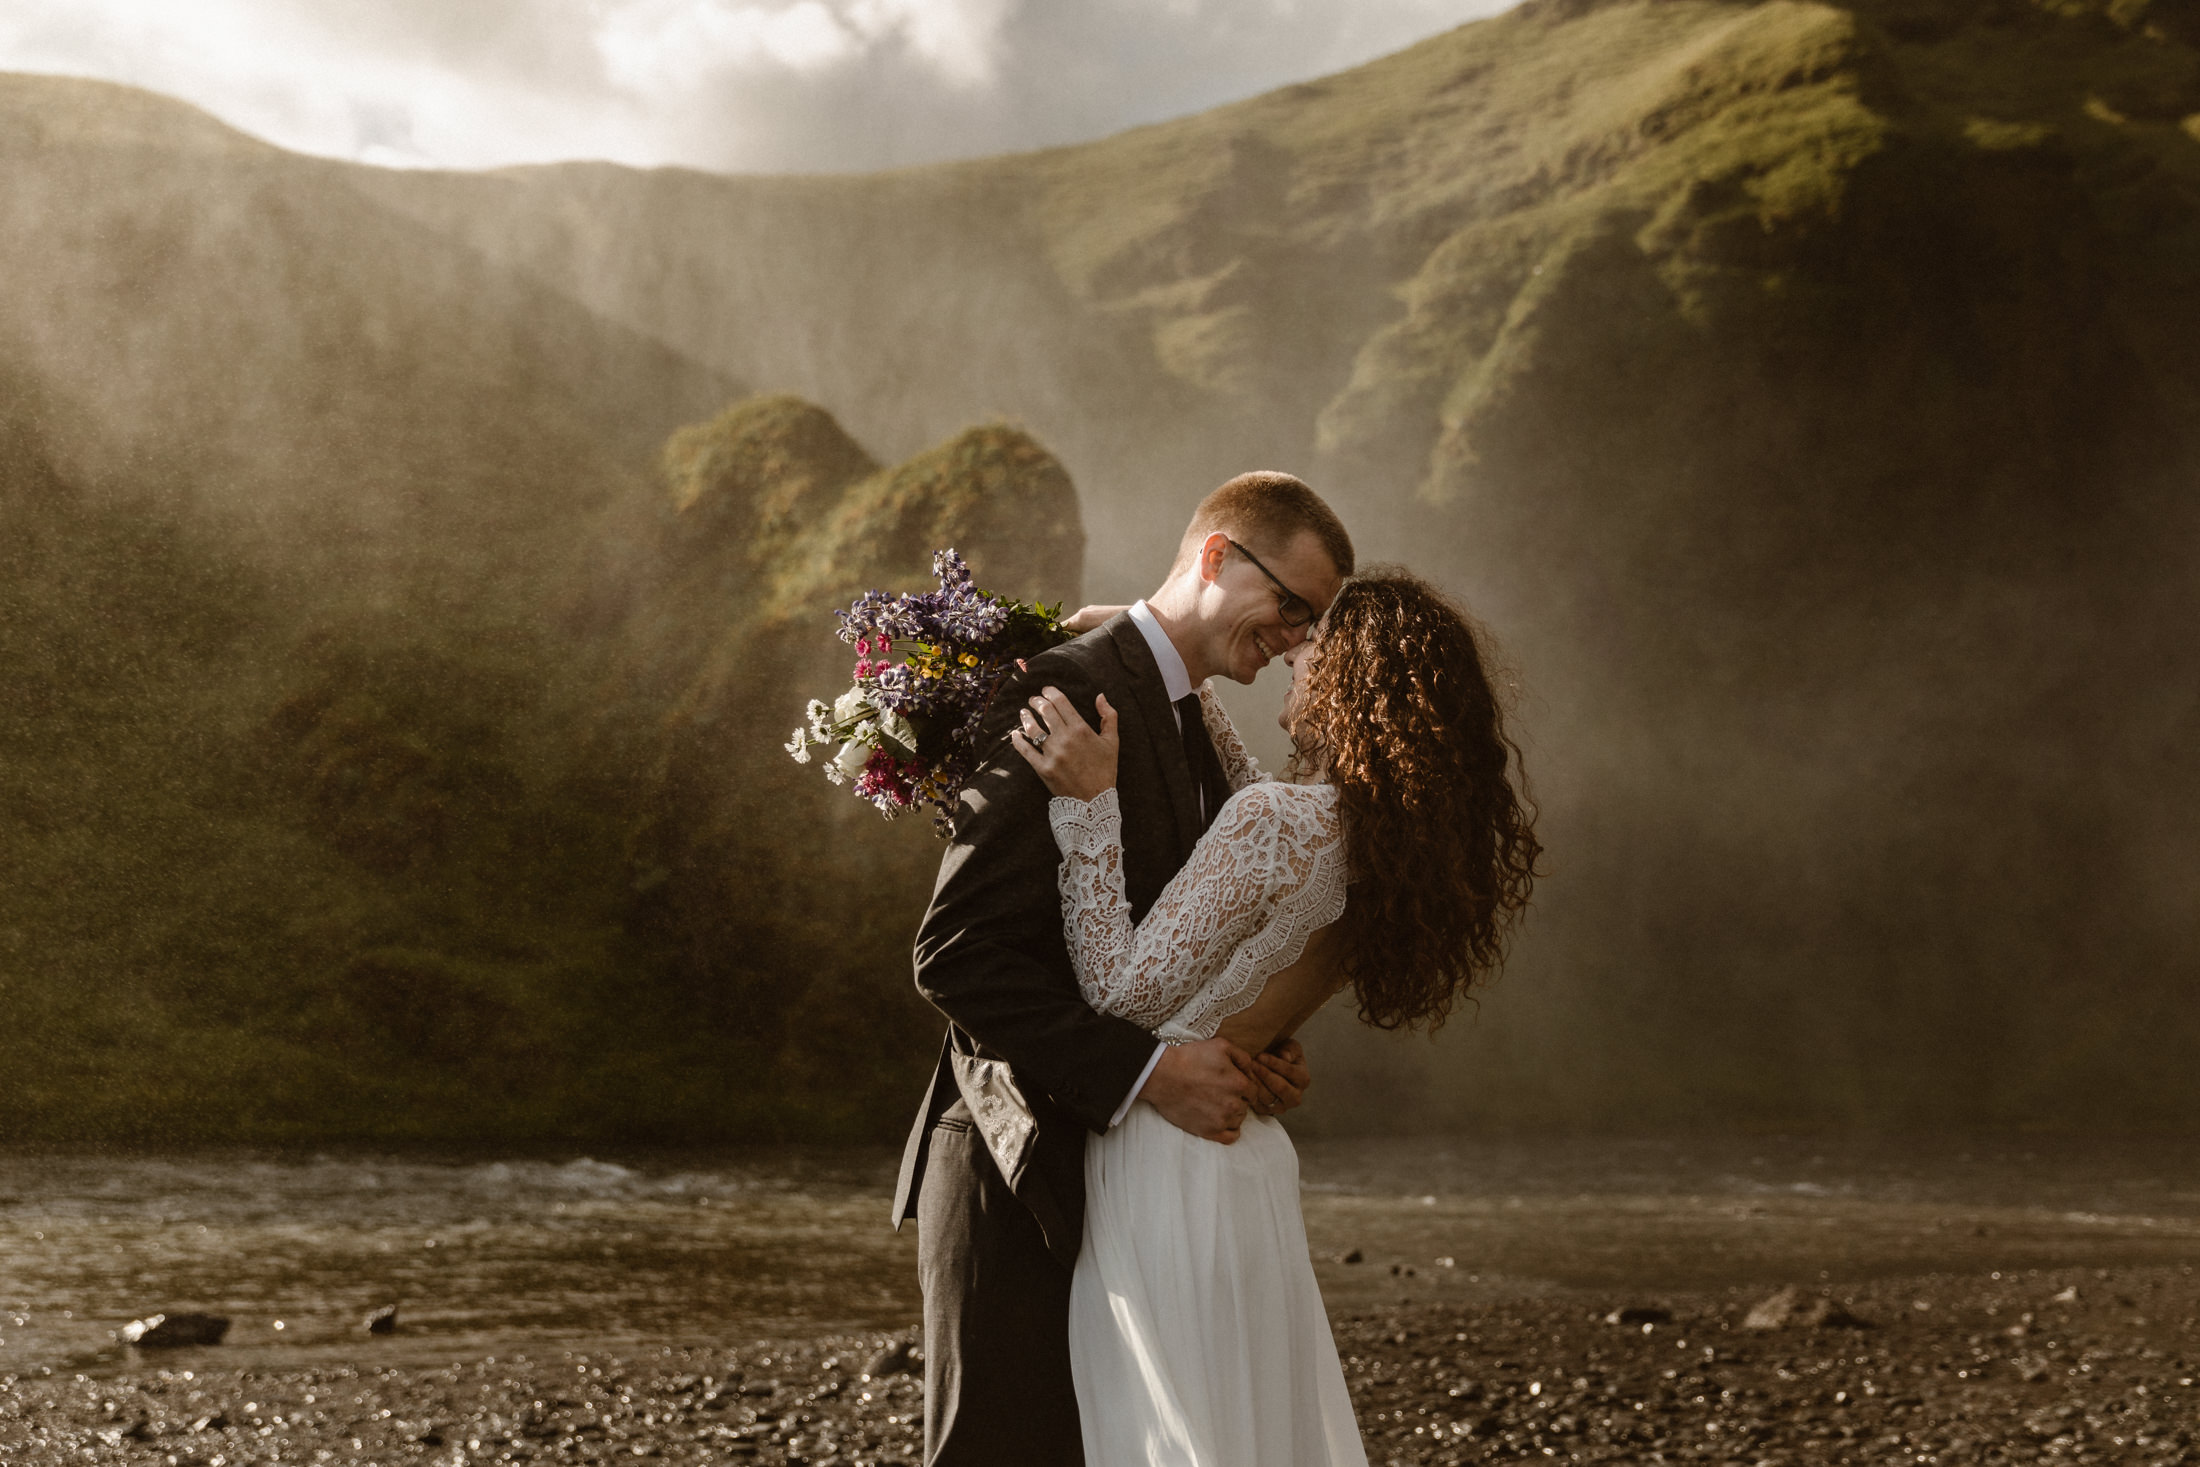 elopement-photos-at-skogafoss-waterfall-in-iceland-narrowleaf-adventure-photography-4728.JPG